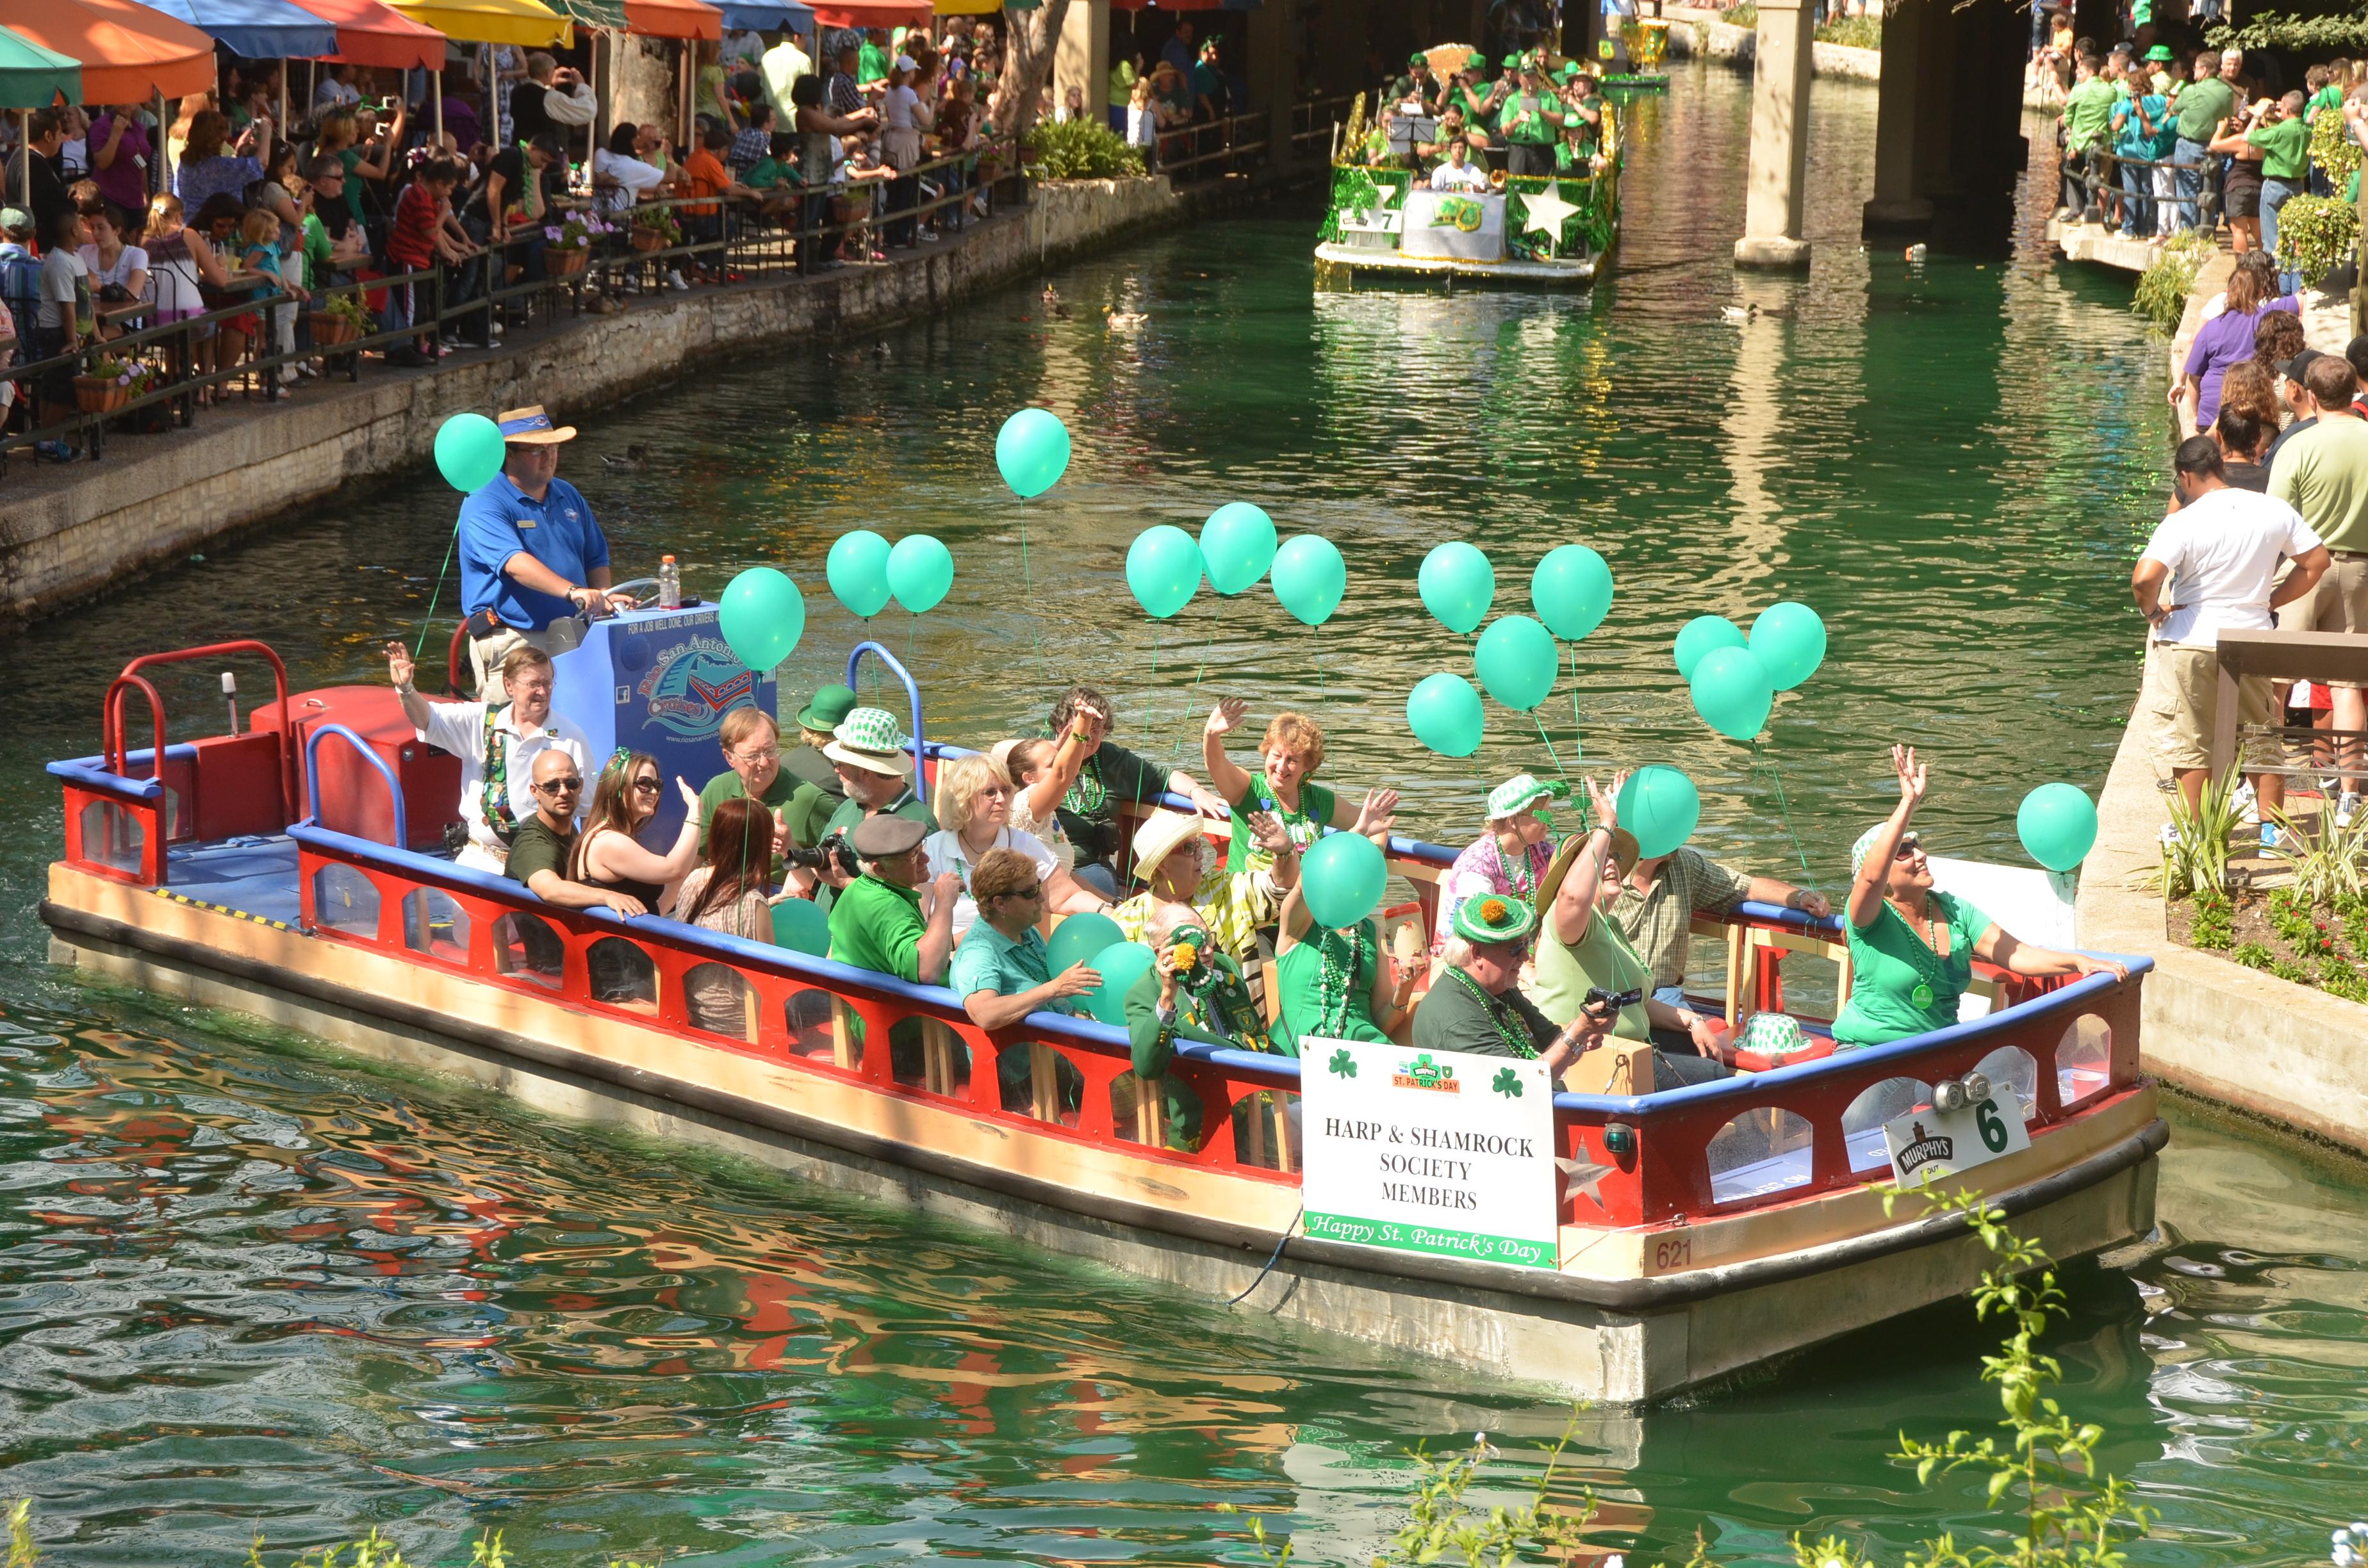 St. Patricks Day, San Antonio. San Antonio River Walk, Events, Holiday, San Antonio Events, Family fun, Family friendly